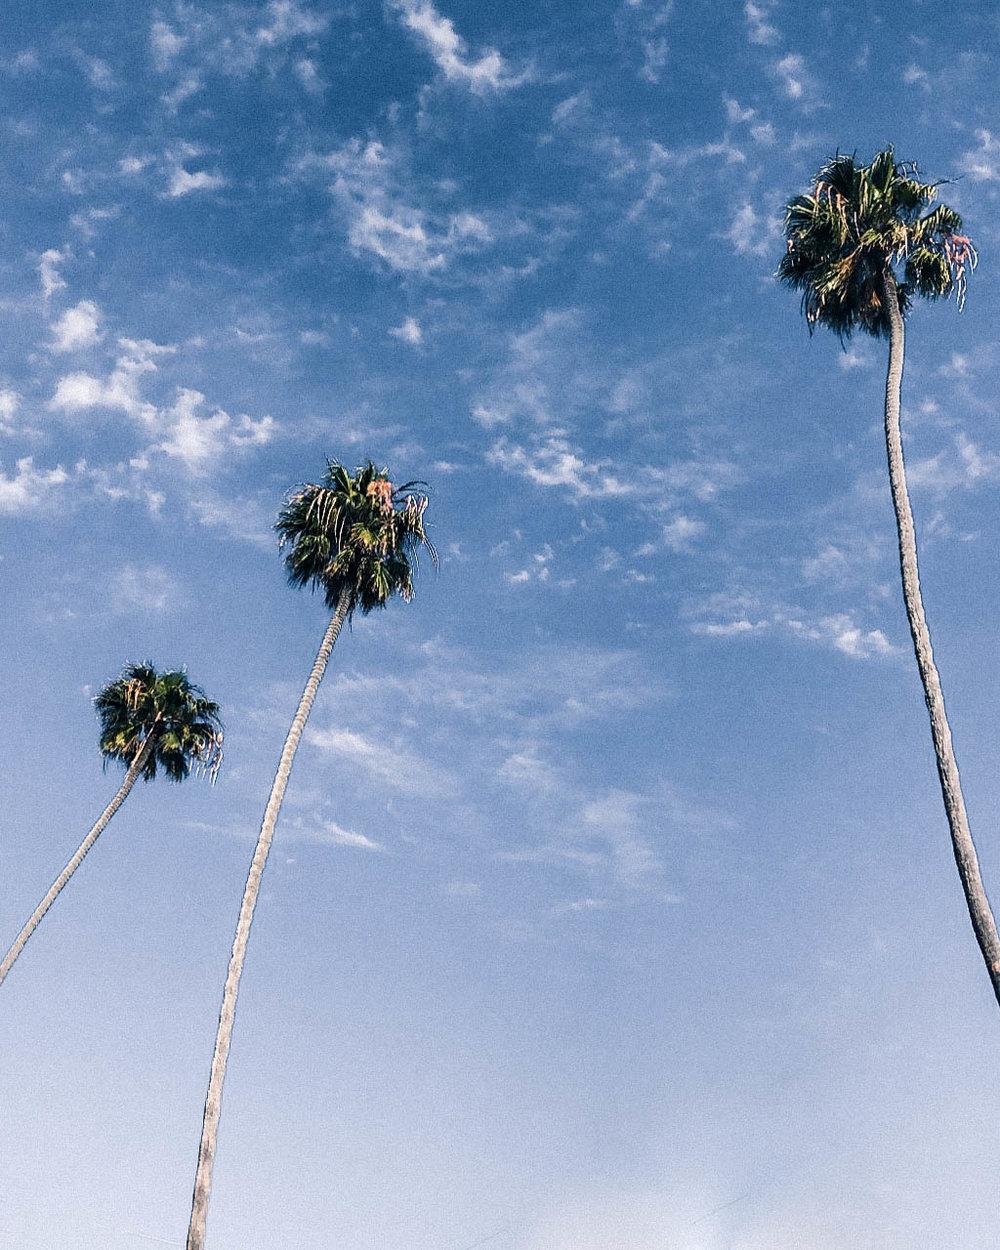 Love those California palms!